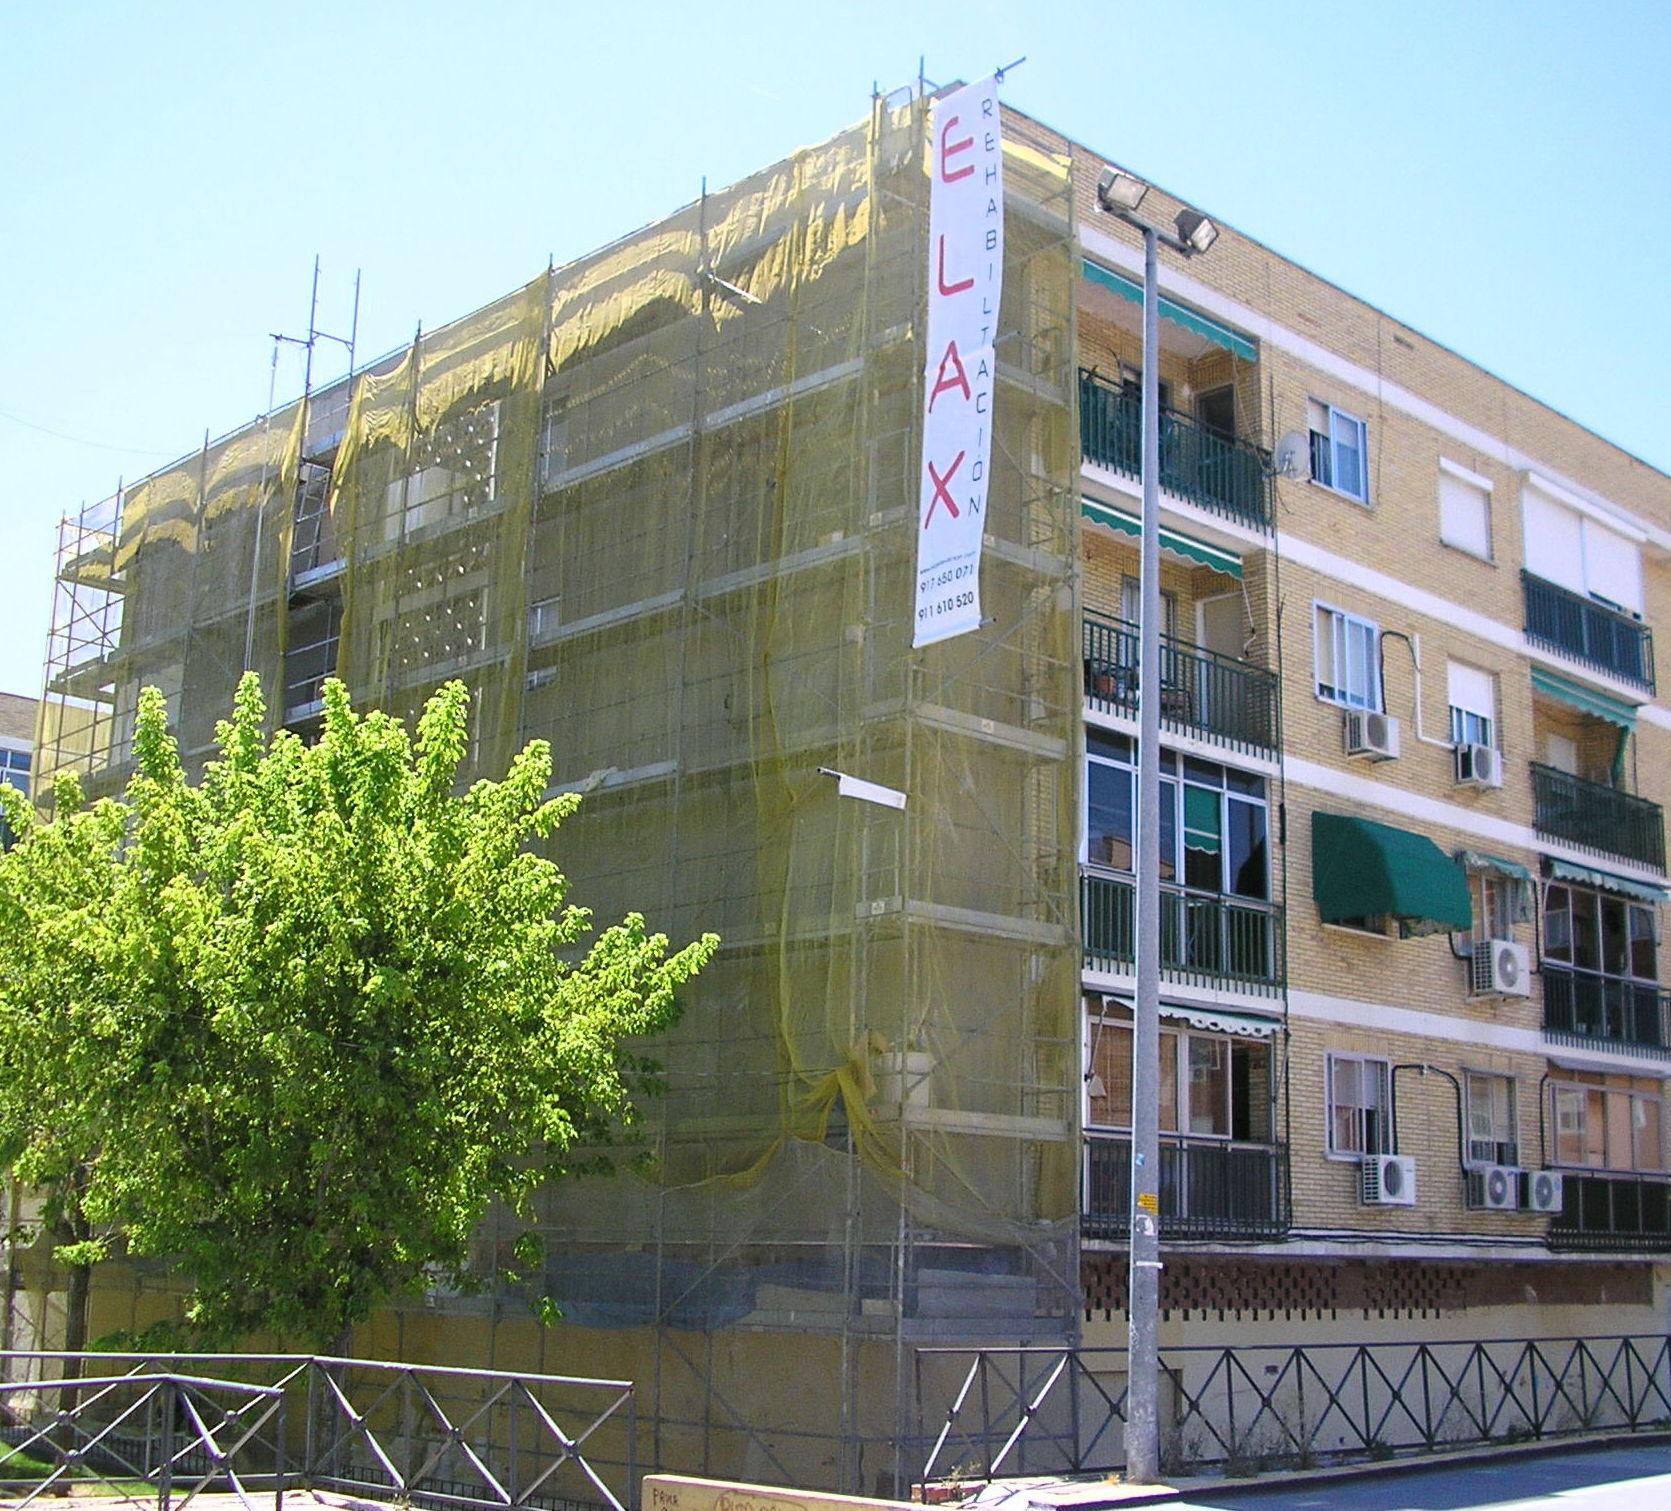 Foto 14 de Rehabilitación de edificios en Madrid | Elax Rehabilitación